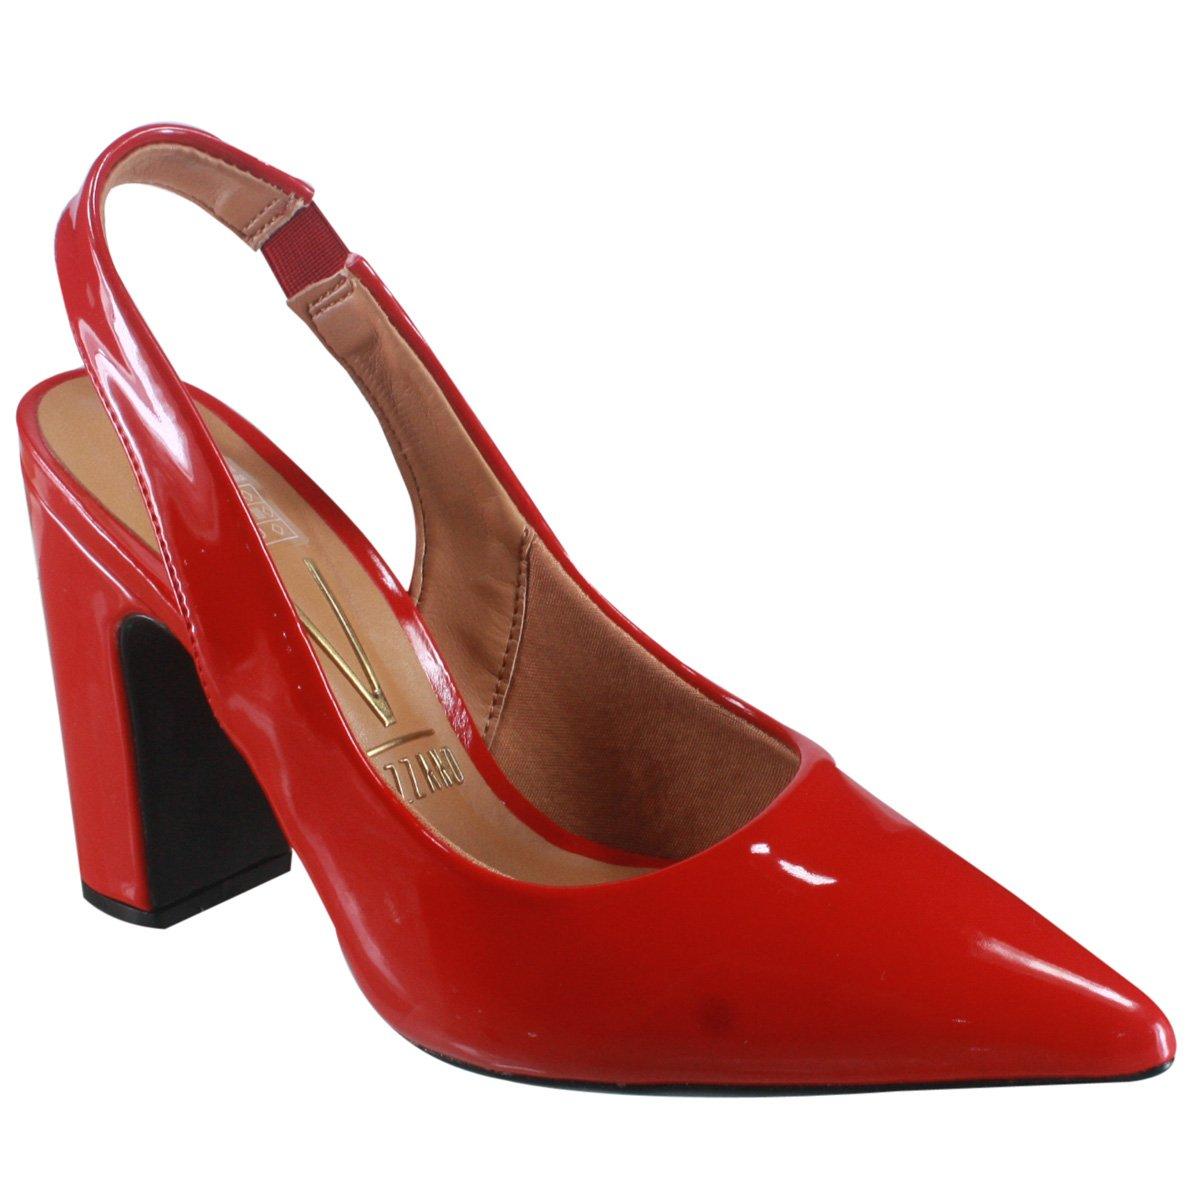 221d117a2 Sapato Feminino Vizzano 1285.103 13488 46175 Vermelho (Verniz Premium)